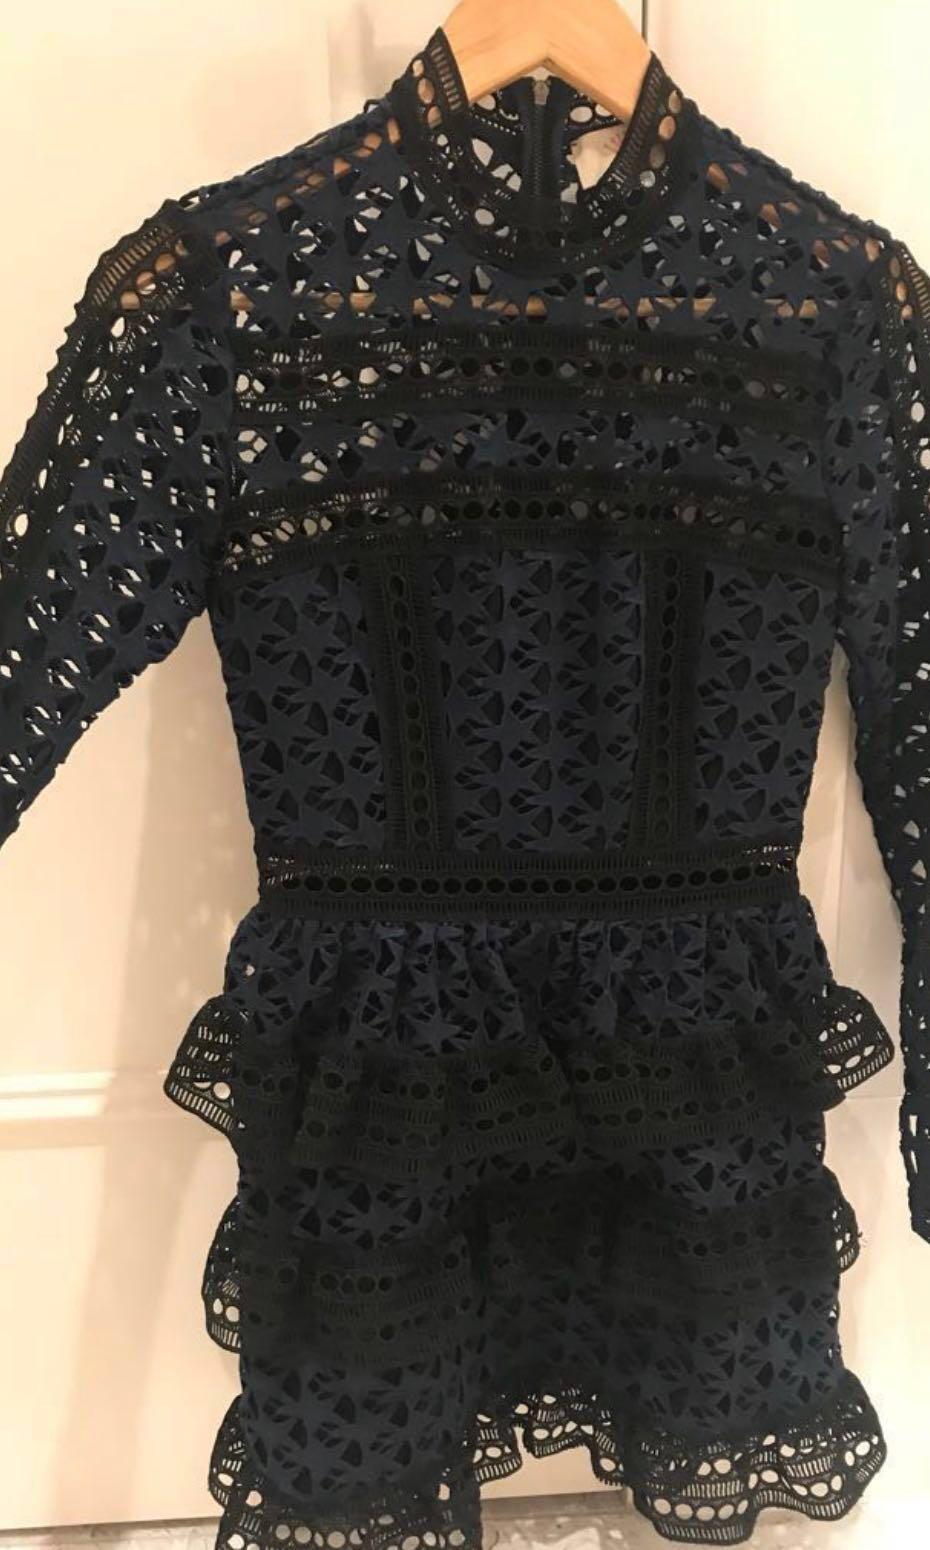 Star lace panel dress navy/black (self portrait inspired)